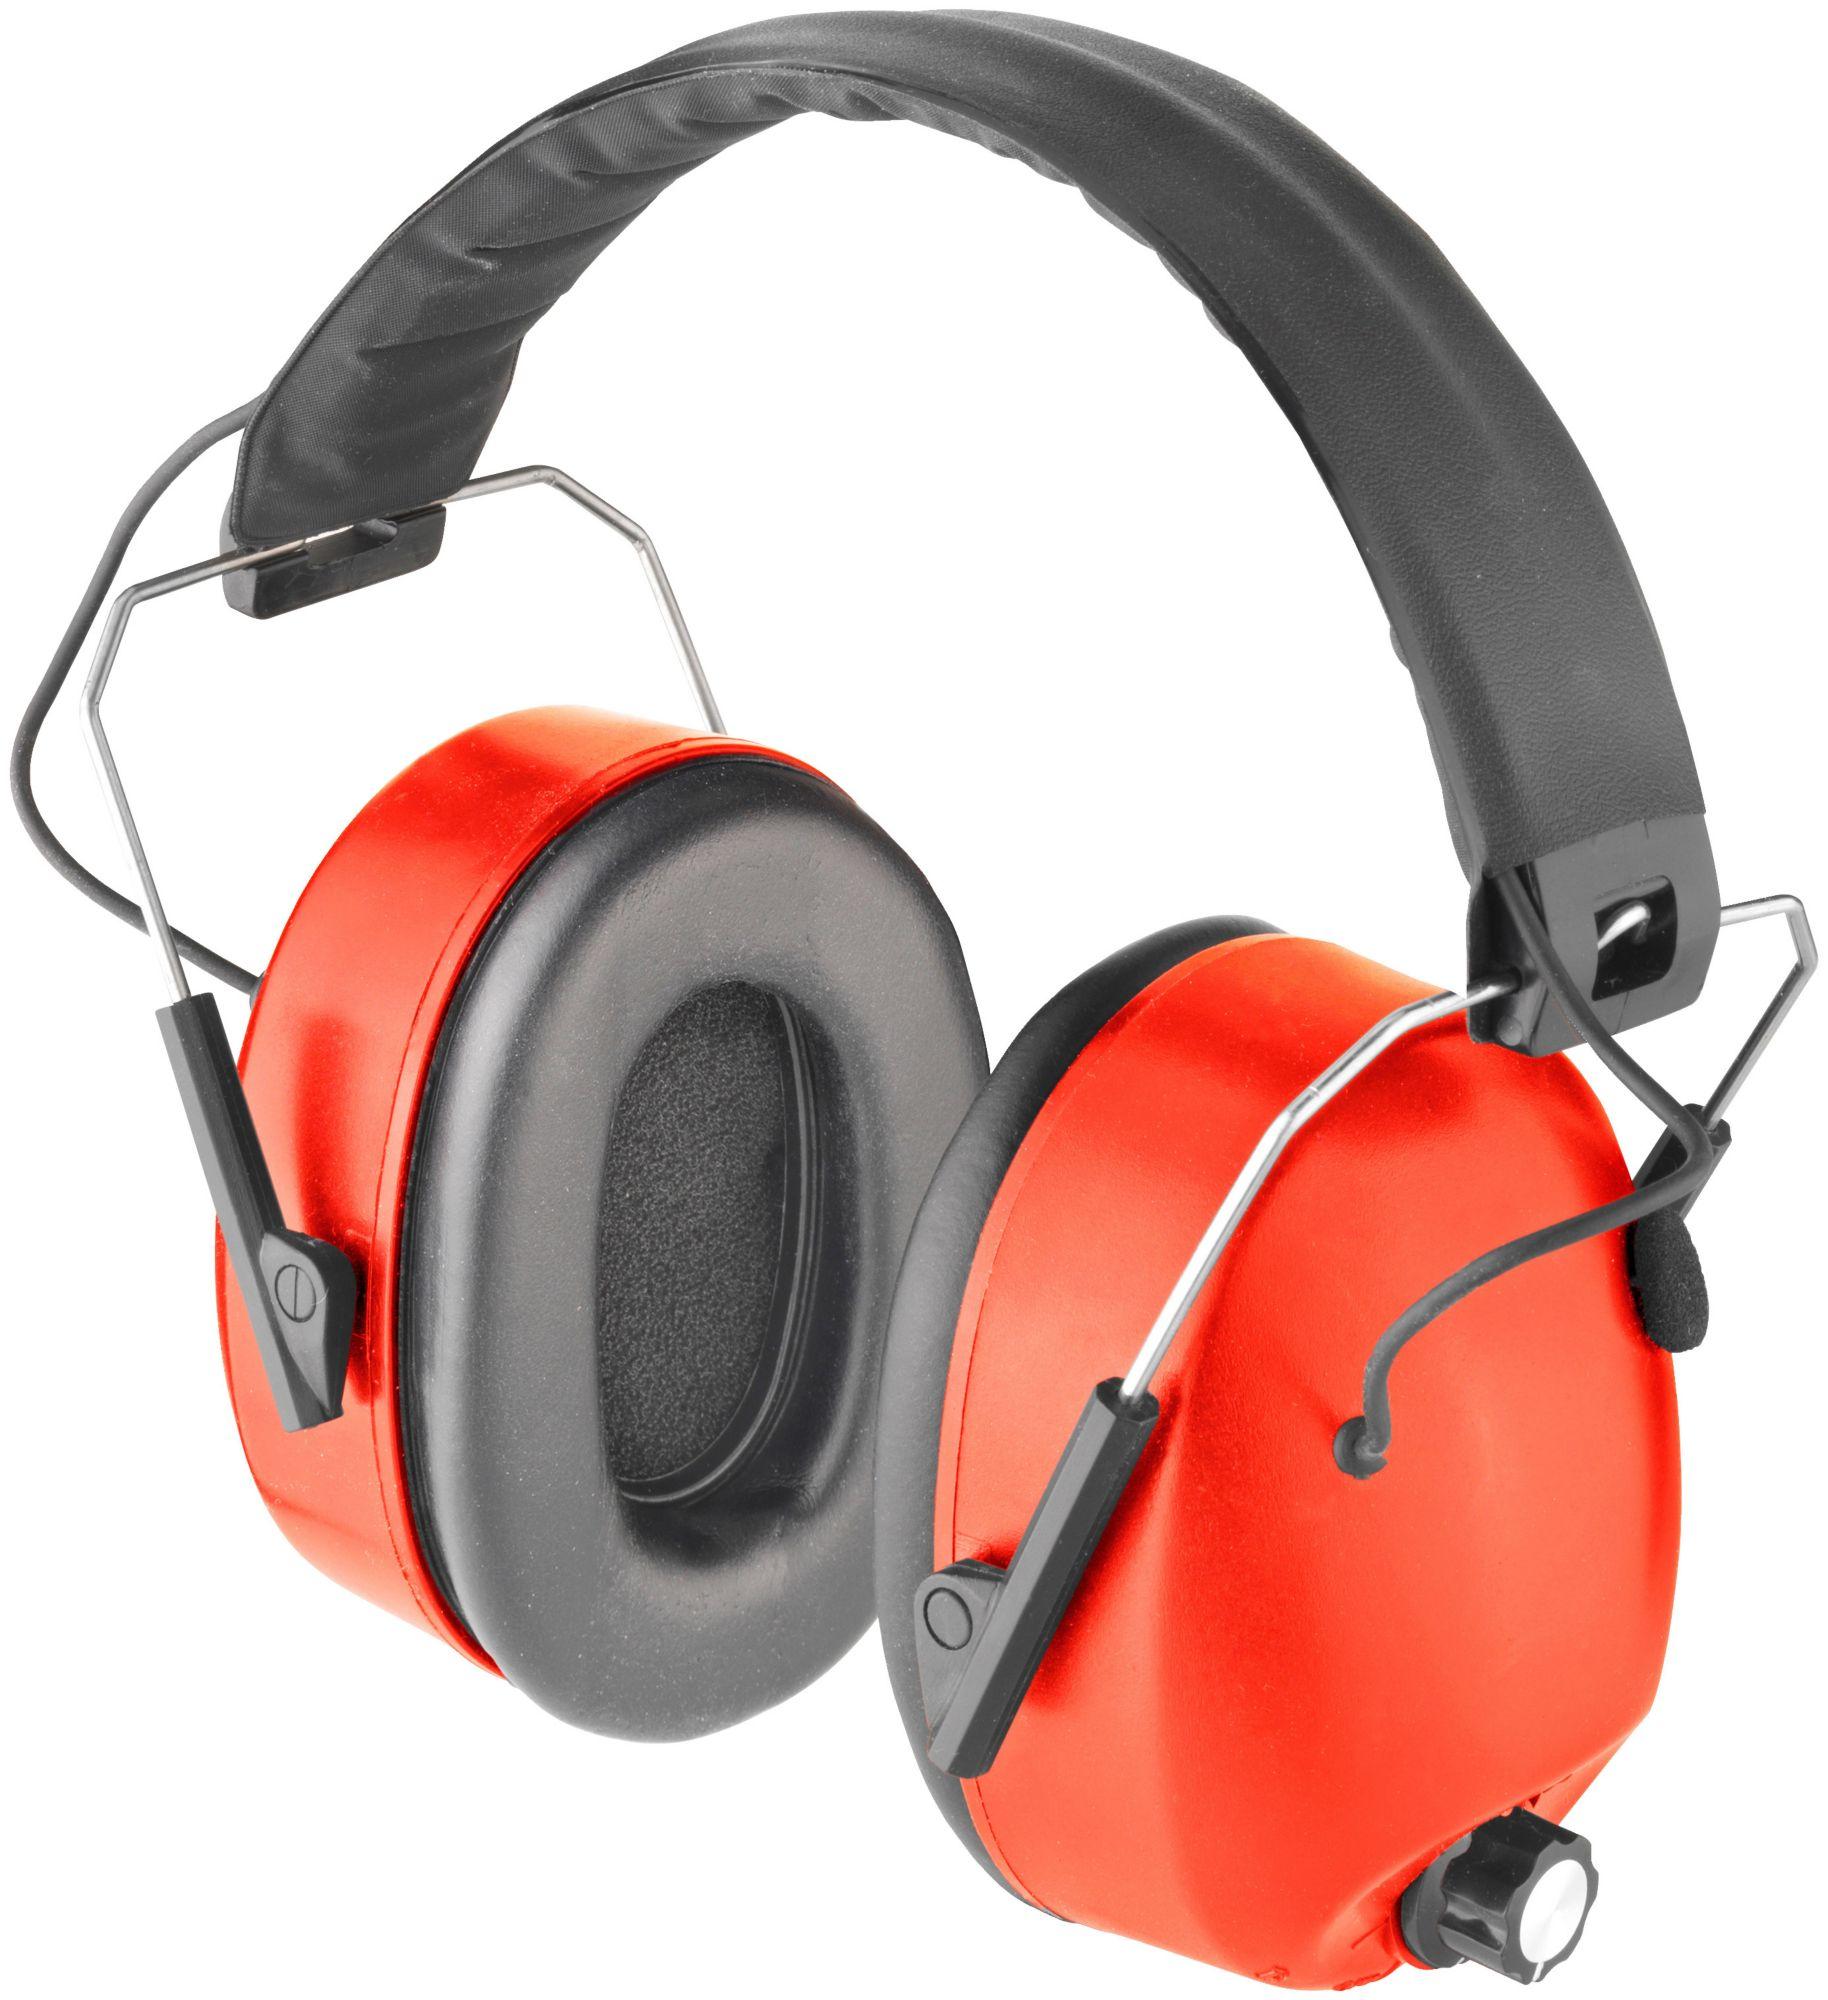 CONNEX Connex Elektronischer Kapselgehörschutz »COXT938709«